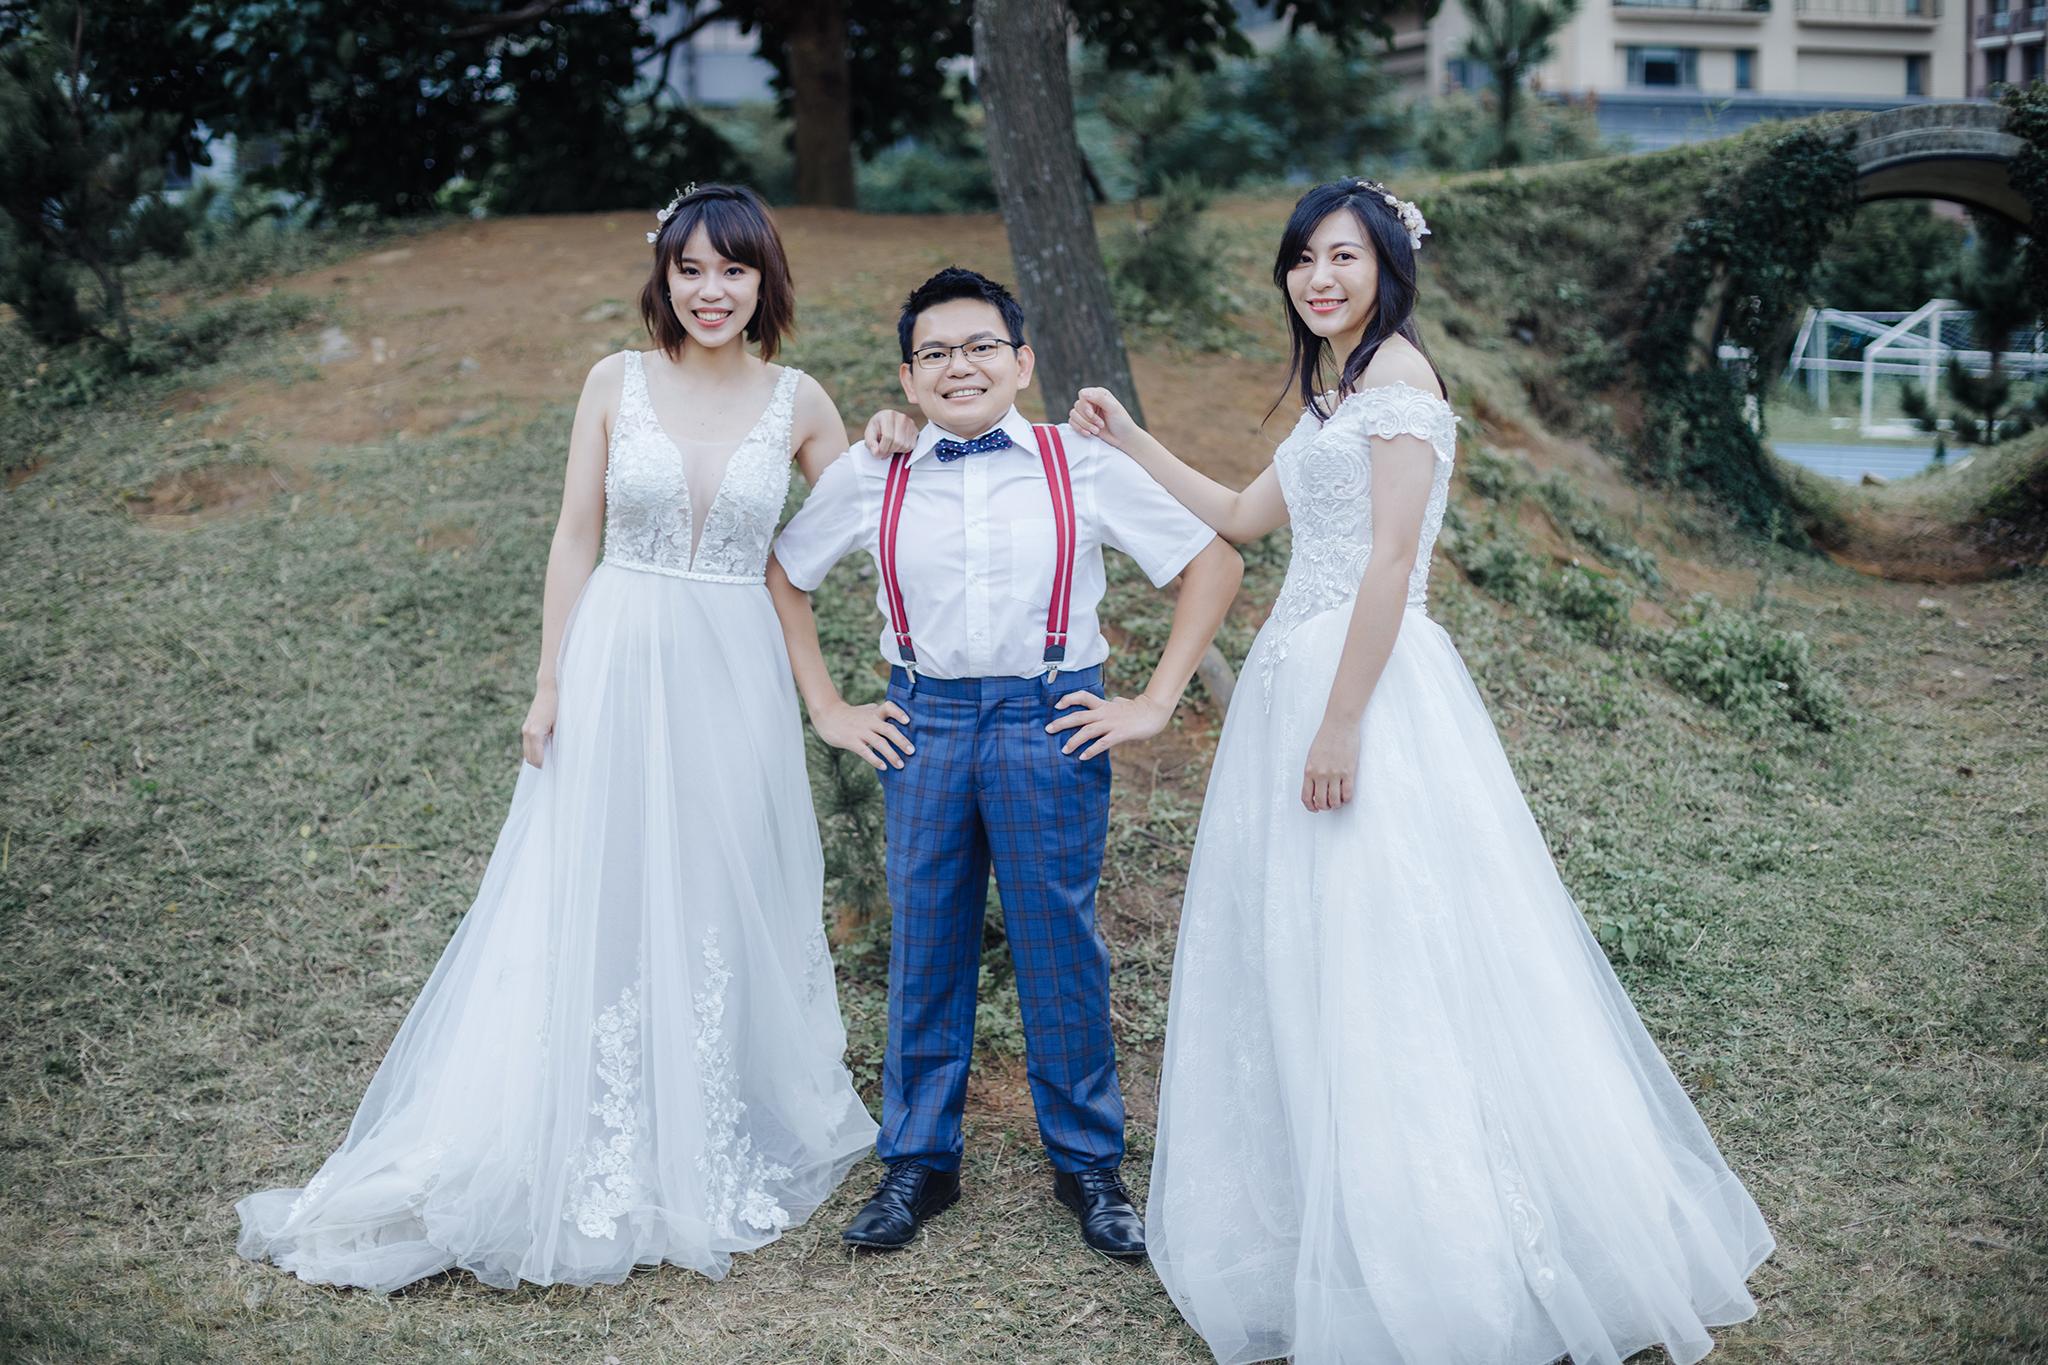 40901344703 80854b05c6 o - 【閨蜜婚紗】+育誠&娟羽&映煦+